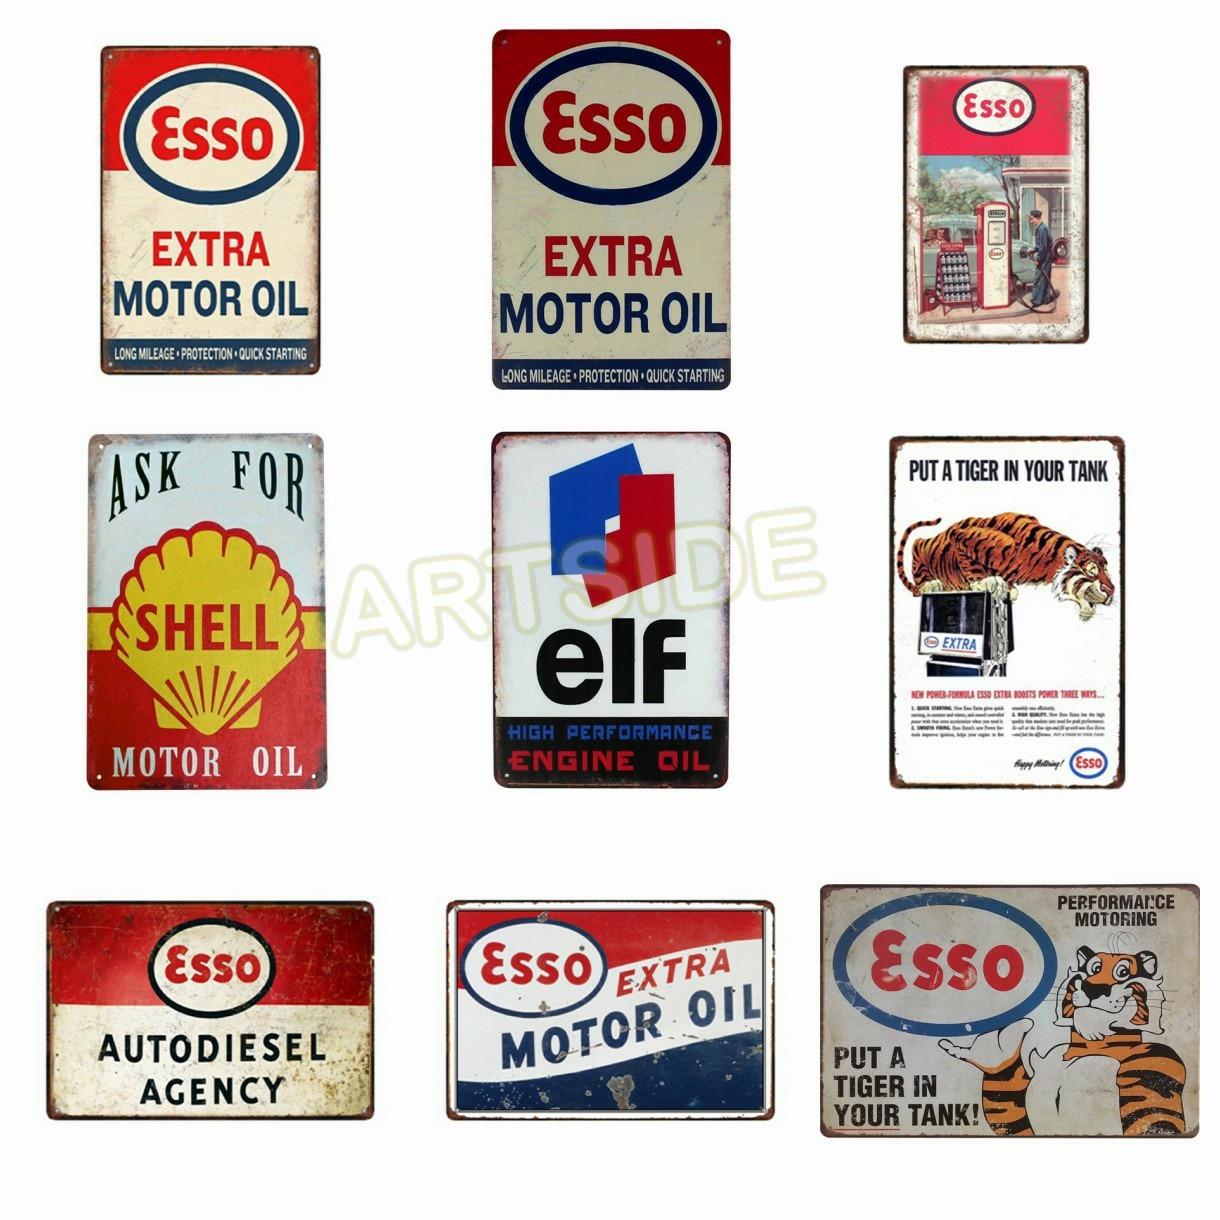 Metal Tin Sign Esso Extral Motor Oil Auto Garage Decor Bar Pub Home Vintage Retro Poster Онихомикоз